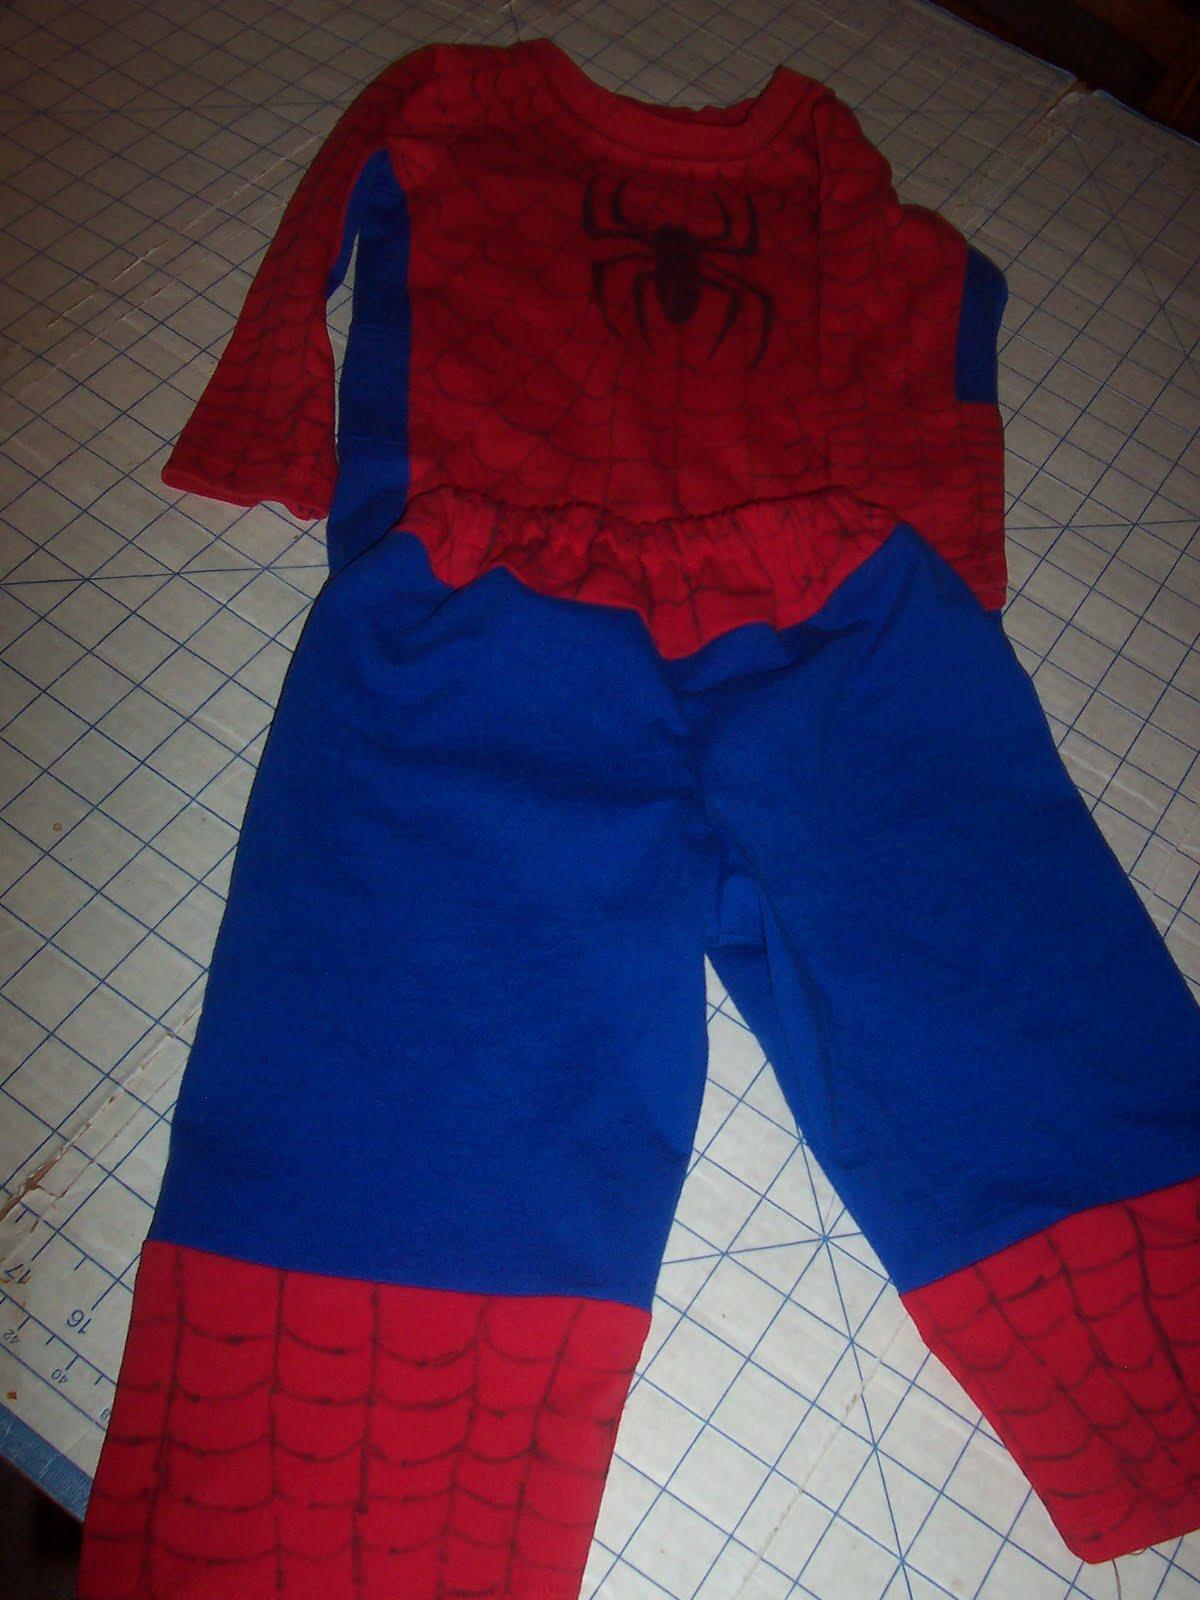 Frugal sewing last minute spiderman costume last minute spiderman costume jeuxipadfo Images